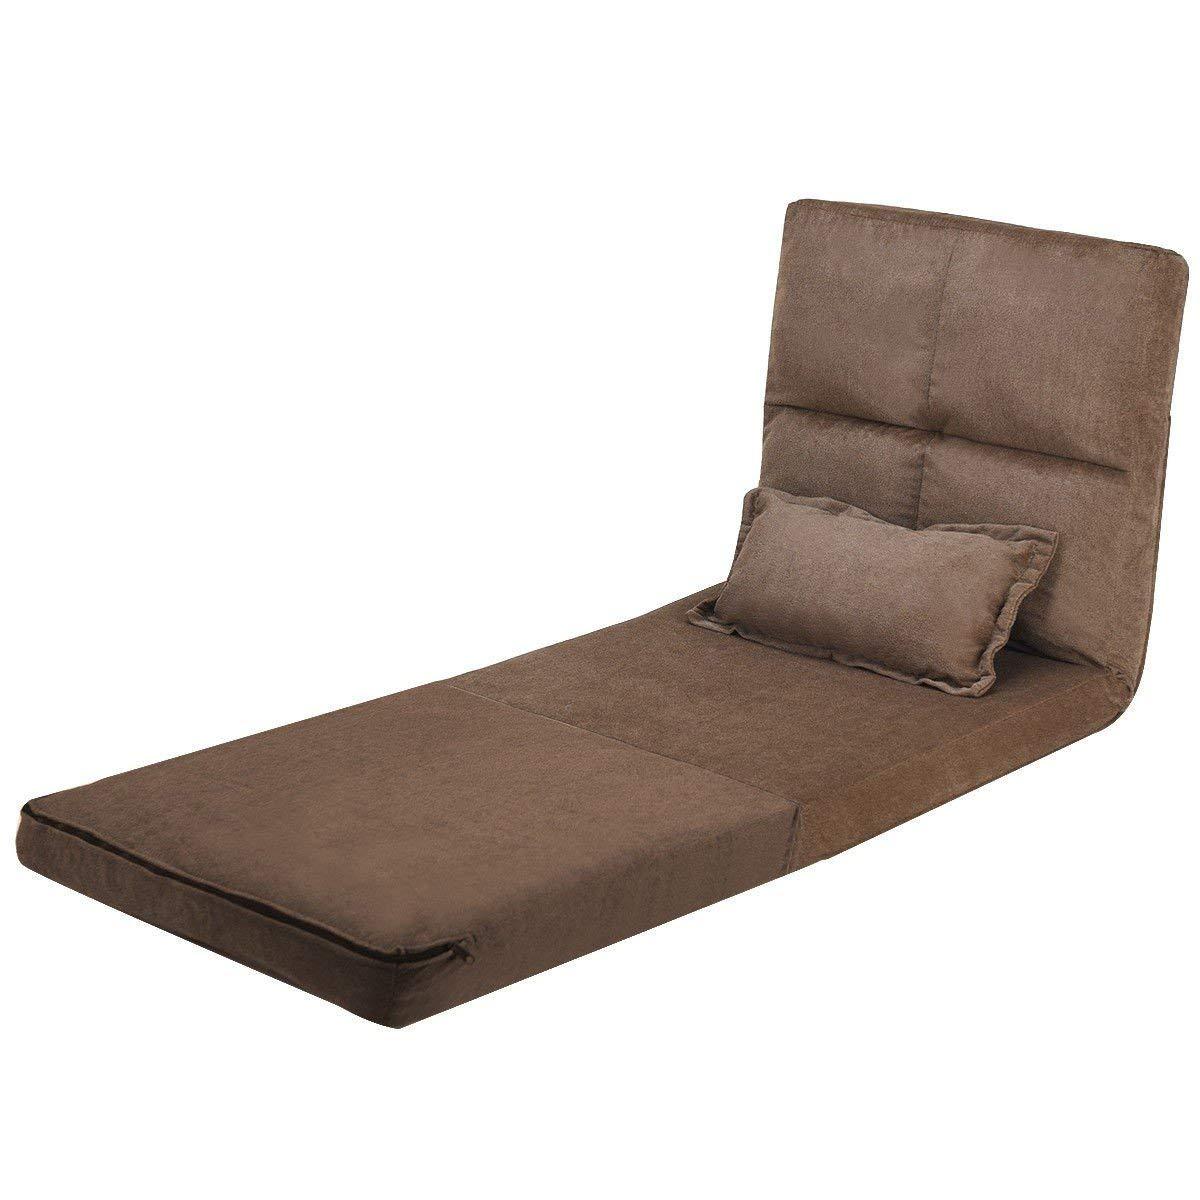 Adult flipout bed